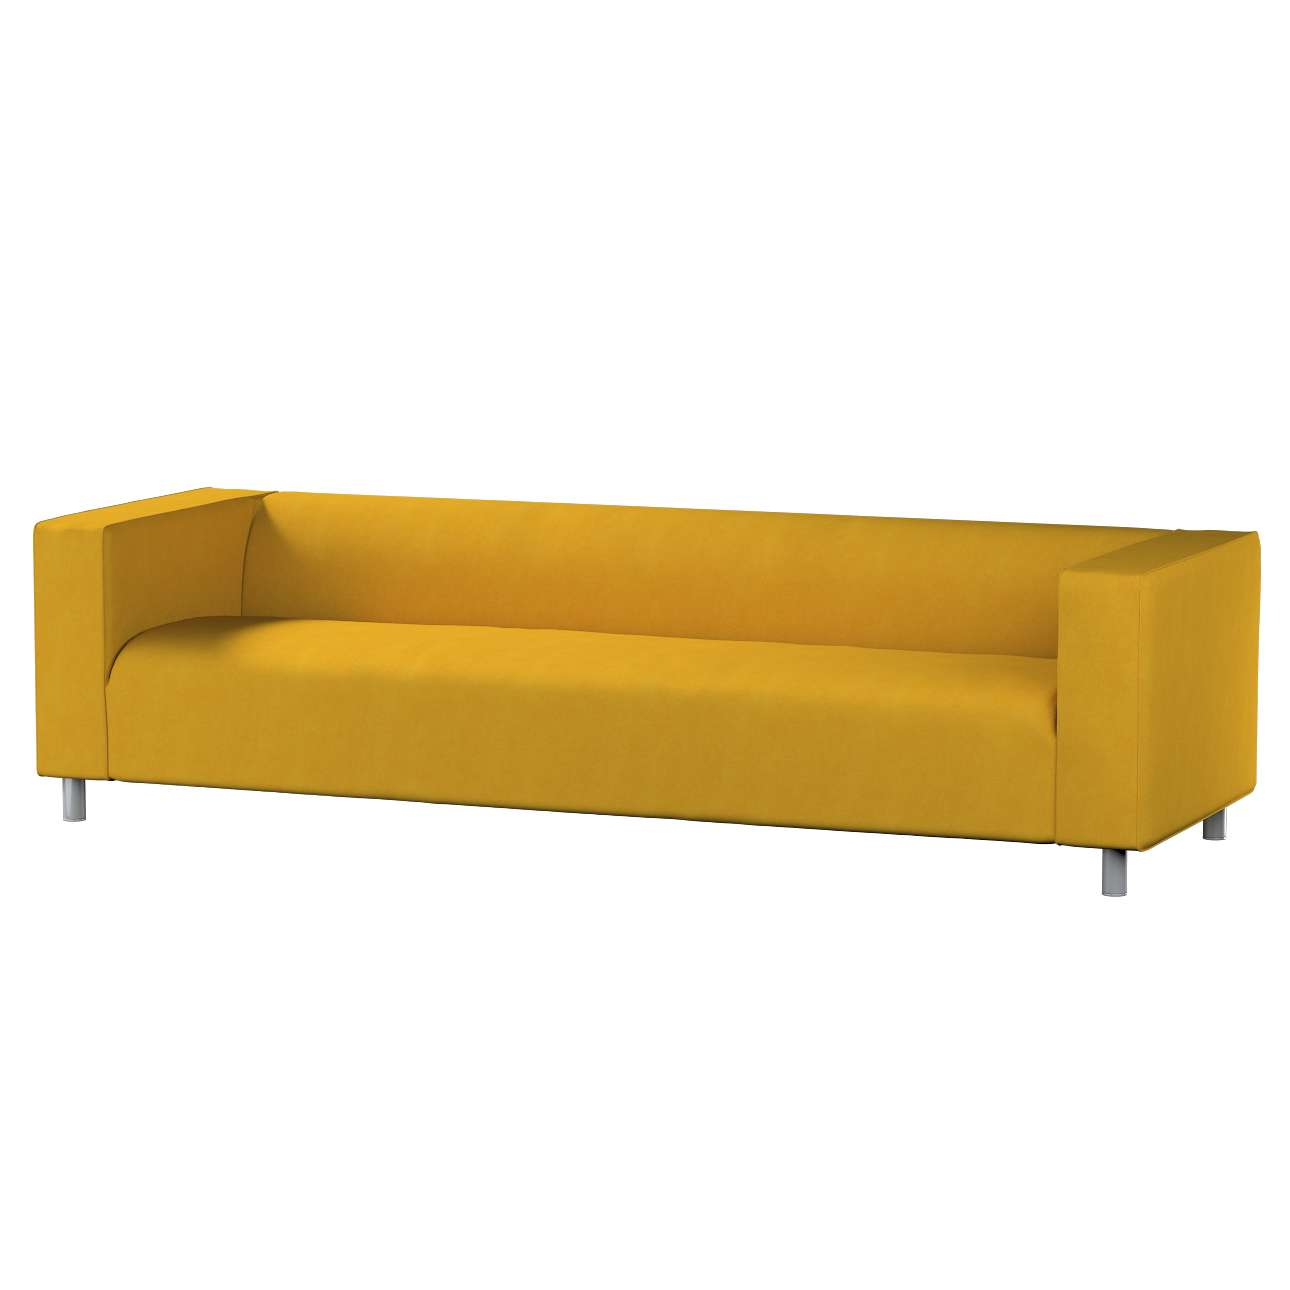 Klippan keturvietės sofos užvalkalas Klippan keturvietė sofa kolekcijoje Etna , audinys: 705-04